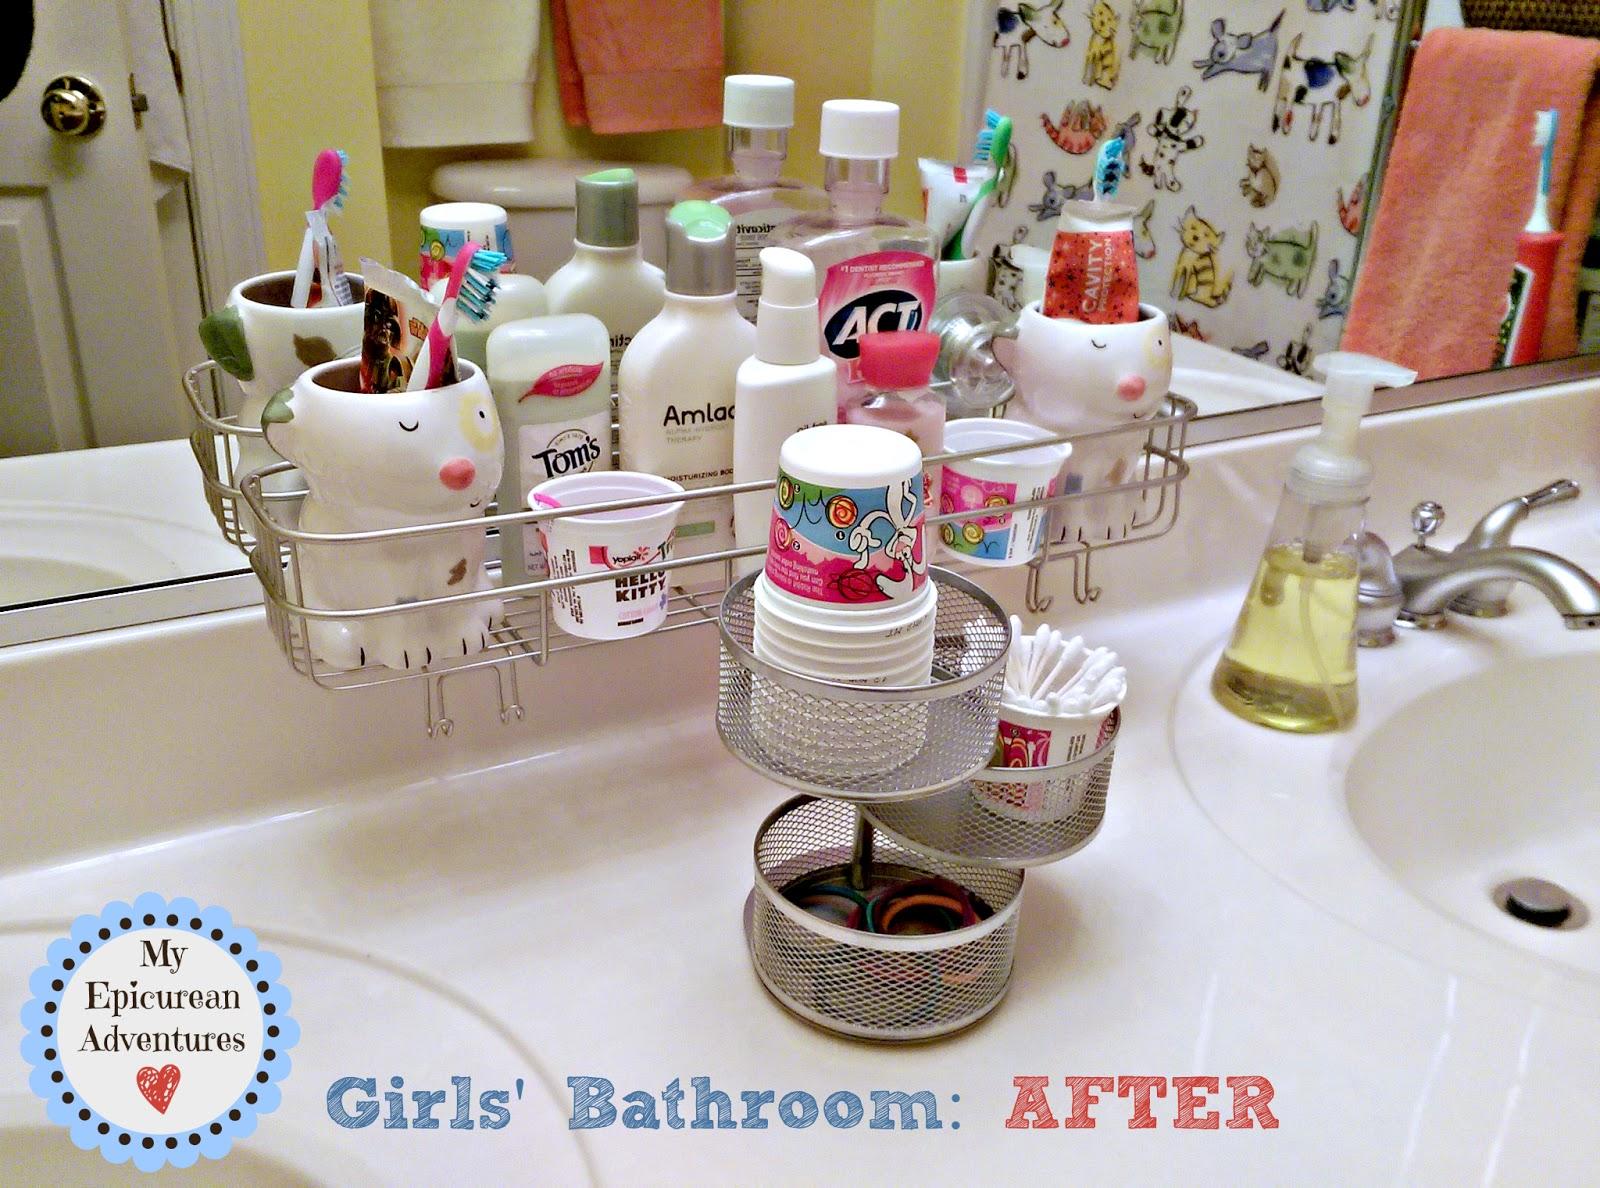 Bathroom Organizers Target bathroom organizers target pictures g3allery | 4moltqa